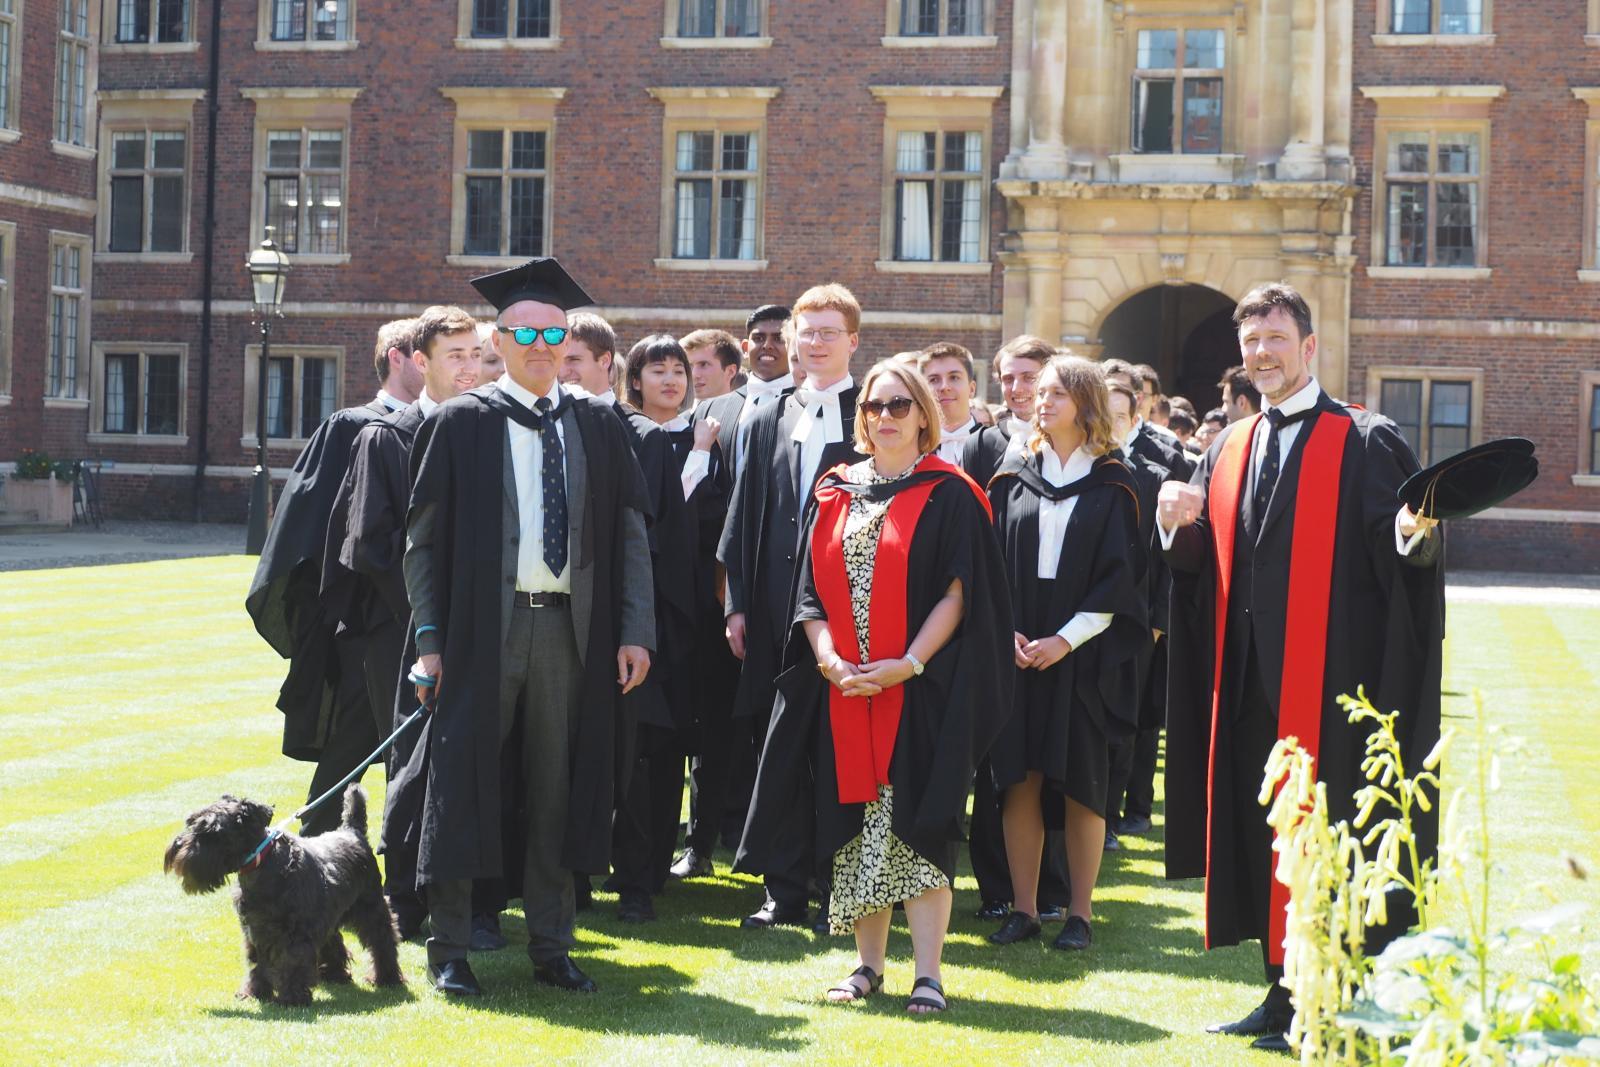 Dr Miranda Griffin 2007 Senior Tutor And Fellow In Mml St Catharine S College Cambridge